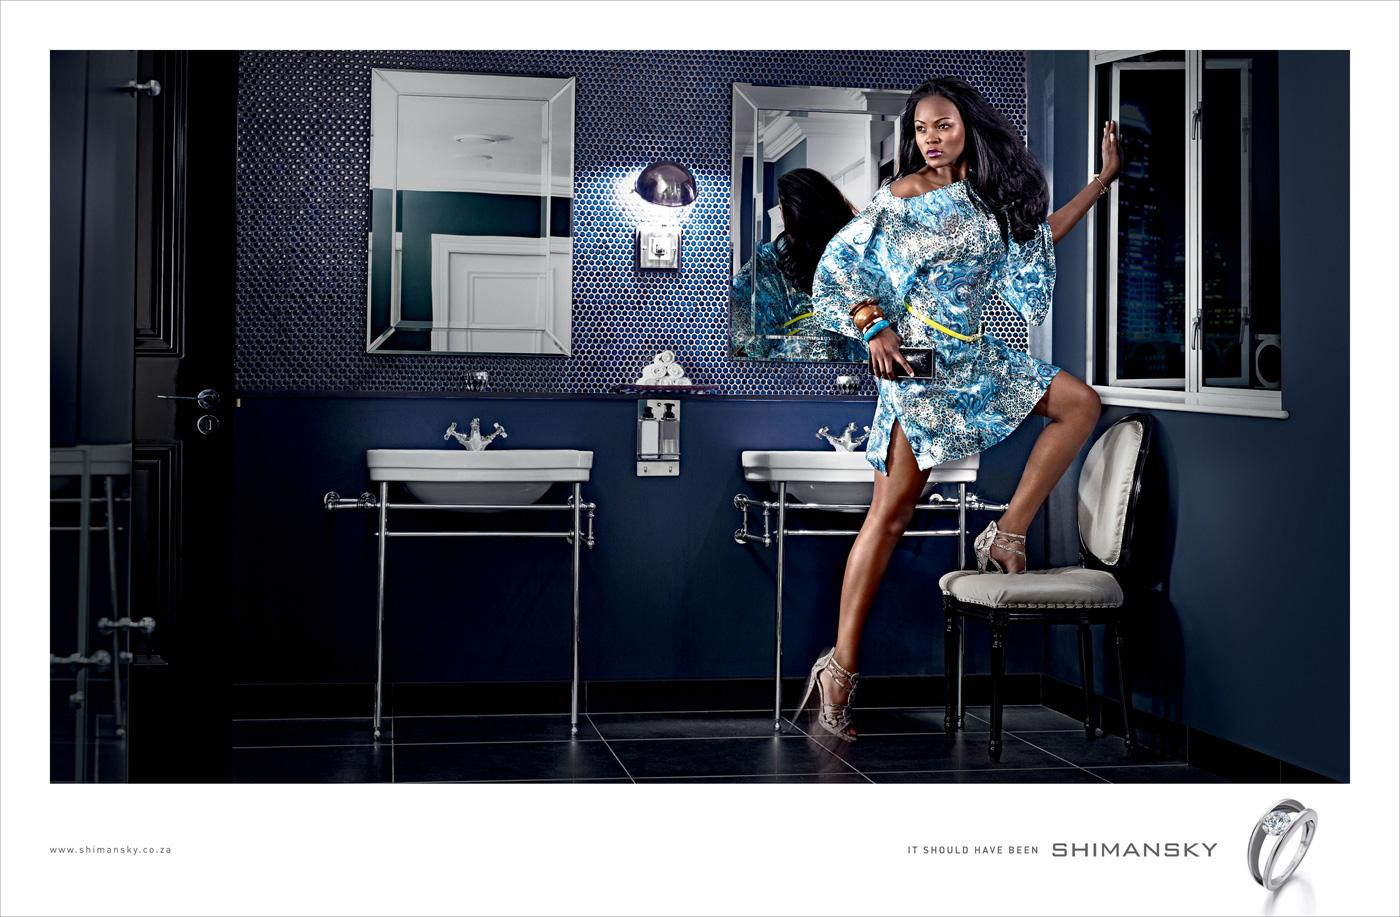 Shimansky Print Ad -  Bathroom escape